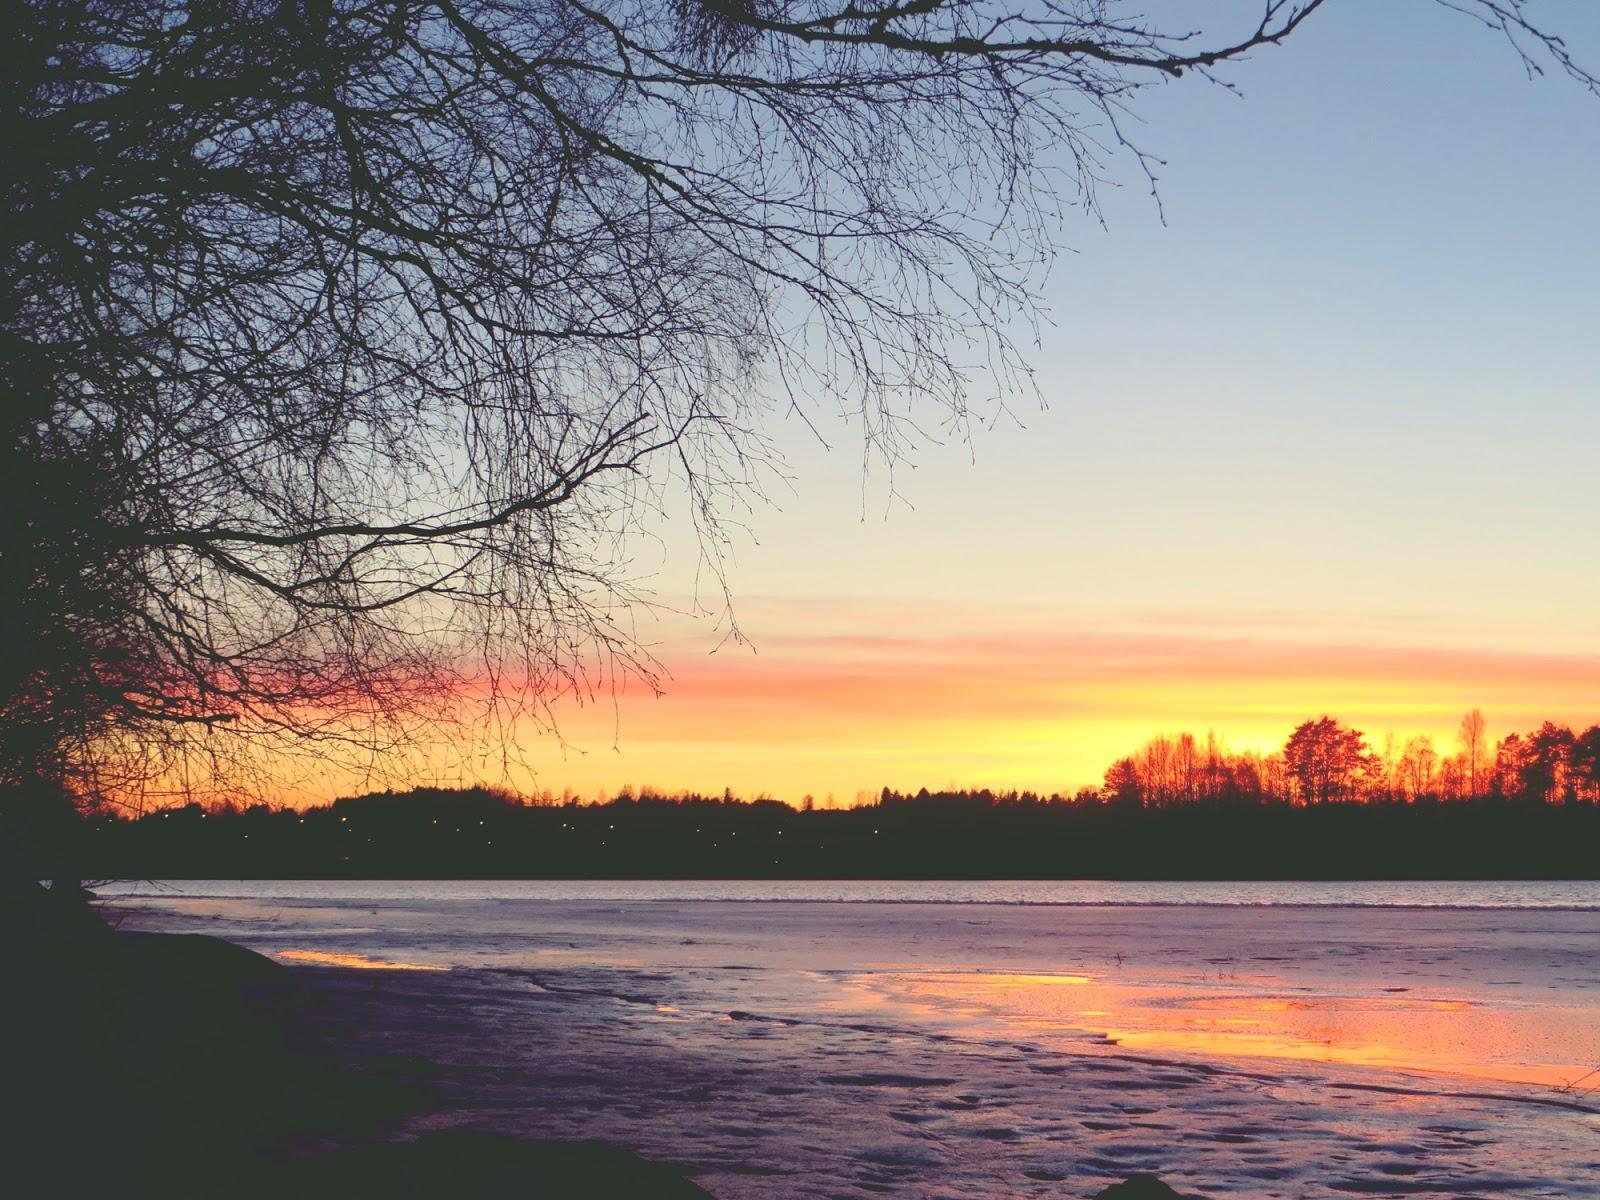 auringonlasku, sunset, Ikaalinen, Kyrösjärvi, auringonlasku Kyrösjärvellä, auringonlasku Ikaalisissa, upea auringonlasku